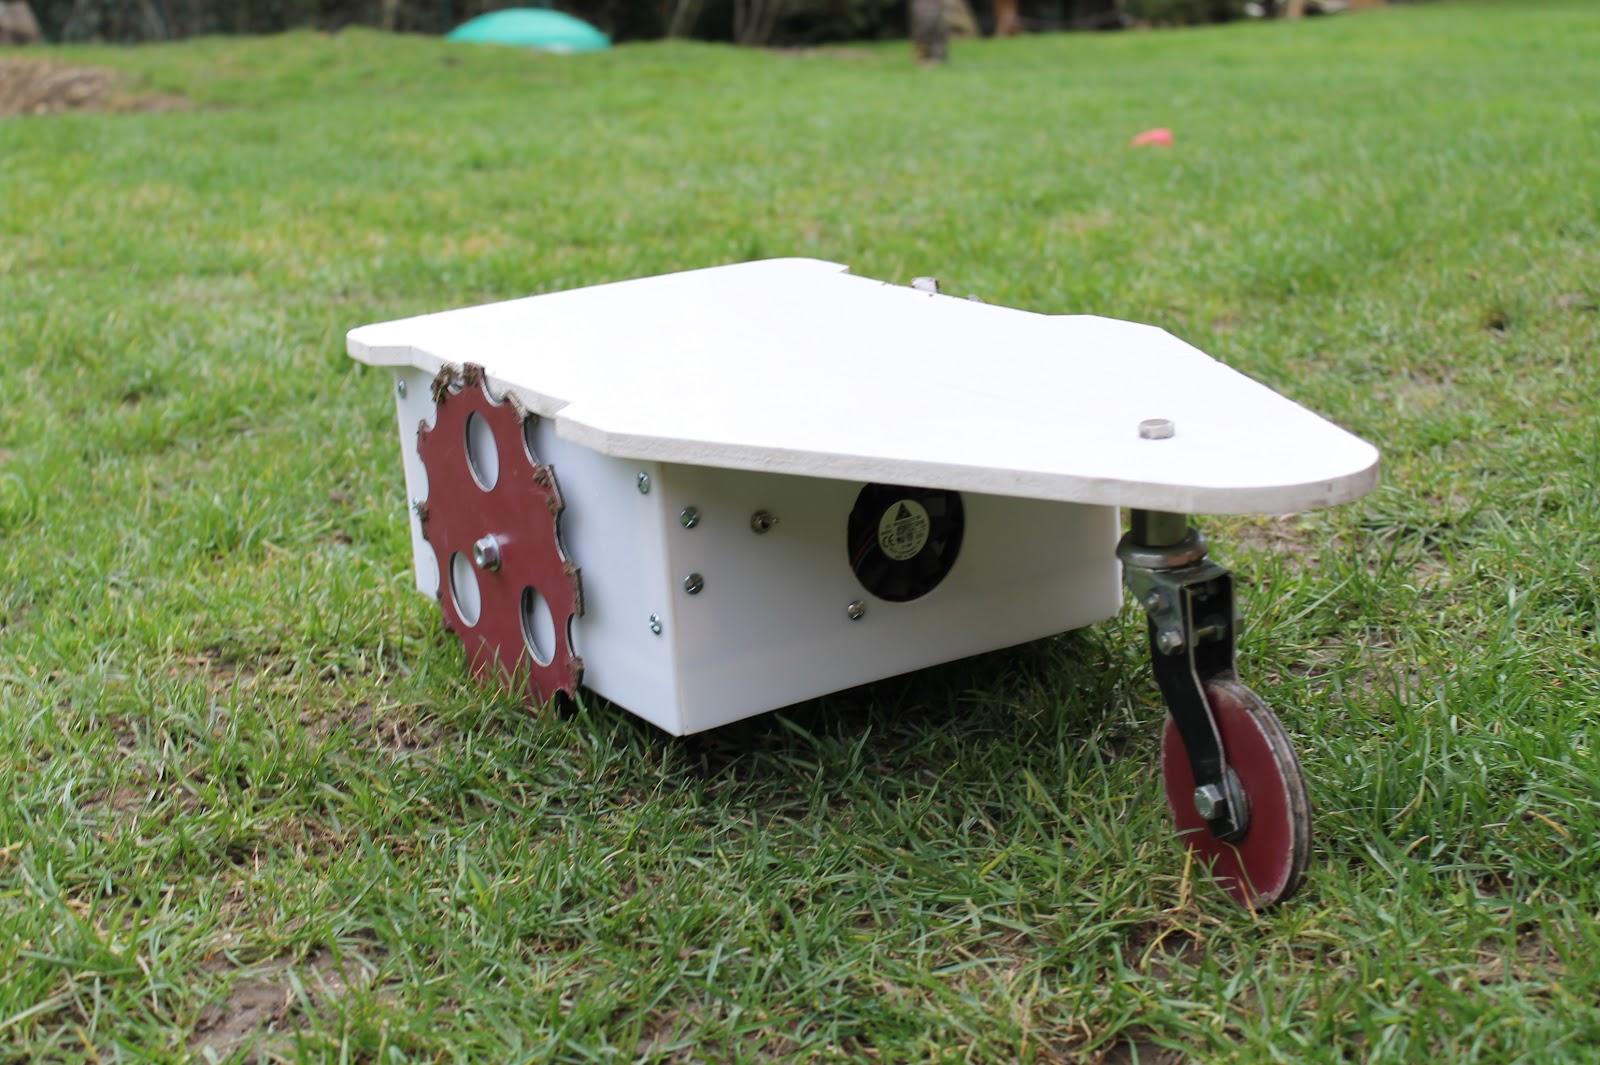 diy cutflower tondeuse robot par arduino. Black Bedroom Furniture Sets. Home Design Ideas